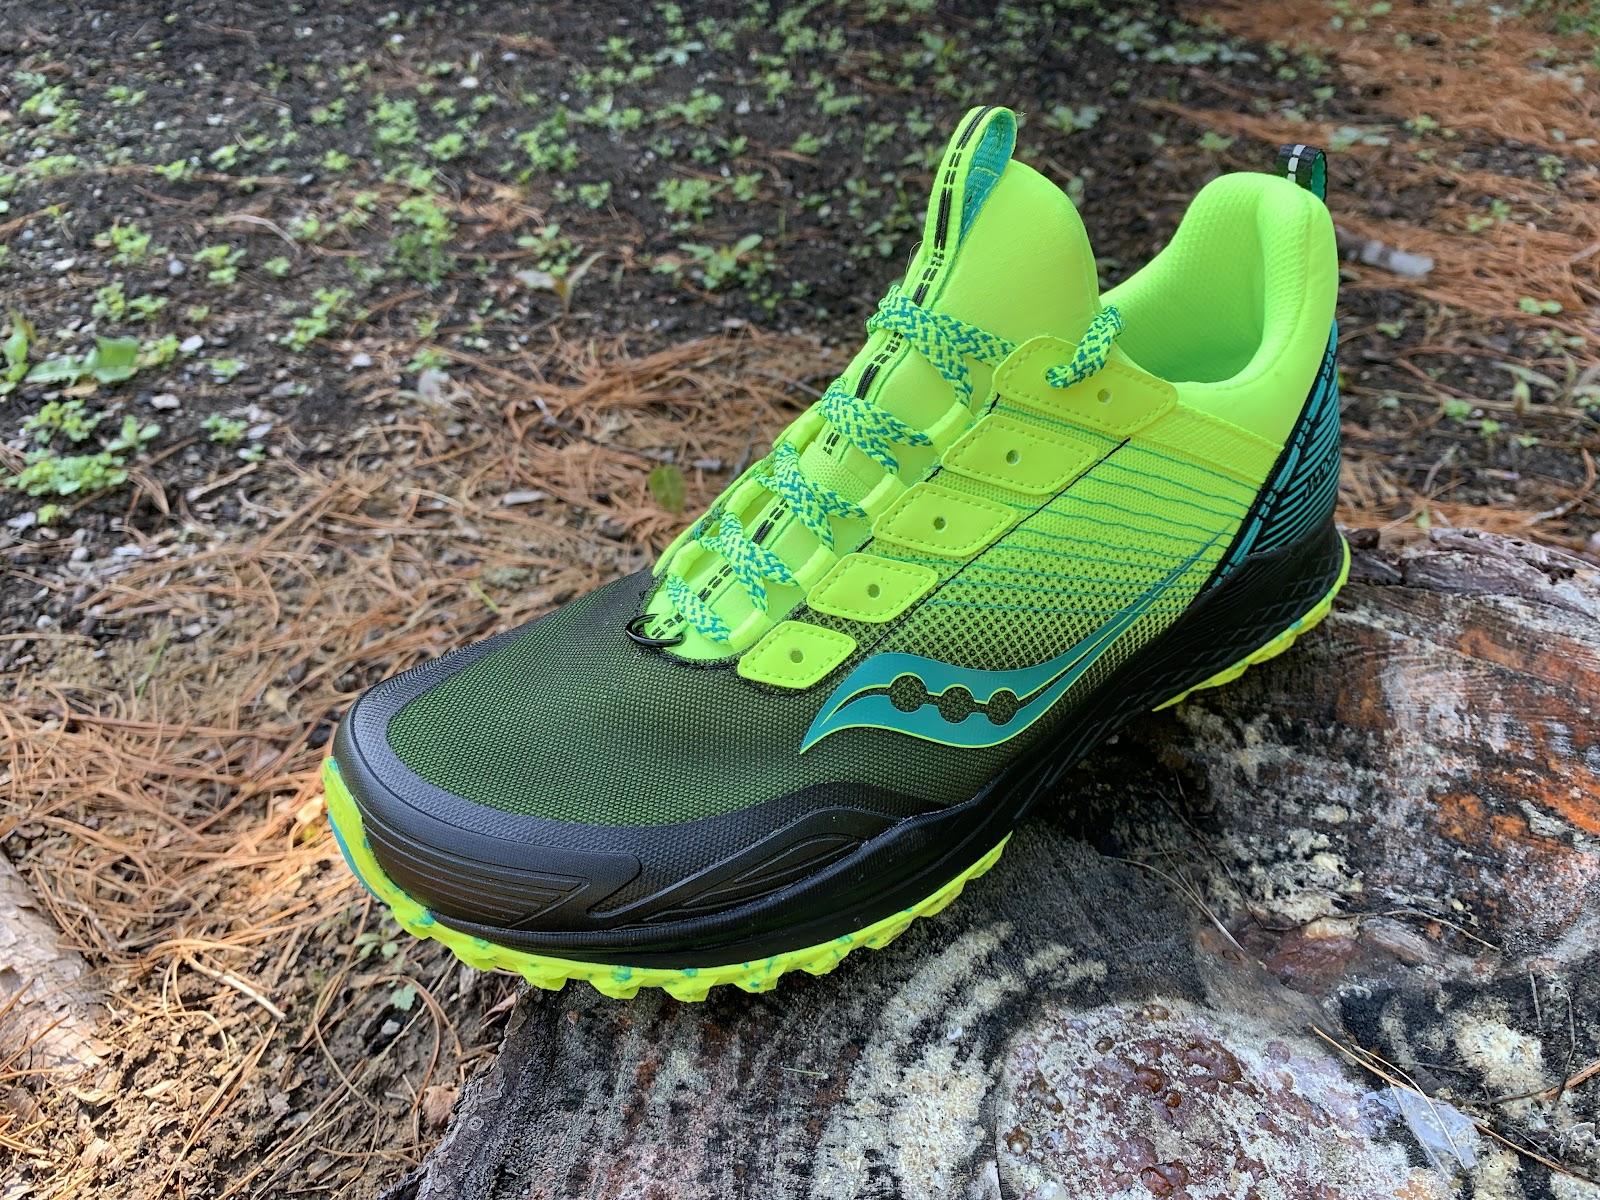 9a514ca6a3 Road Trail Run: Saucony Mad River TR Review - A Unique Trail Runner ...